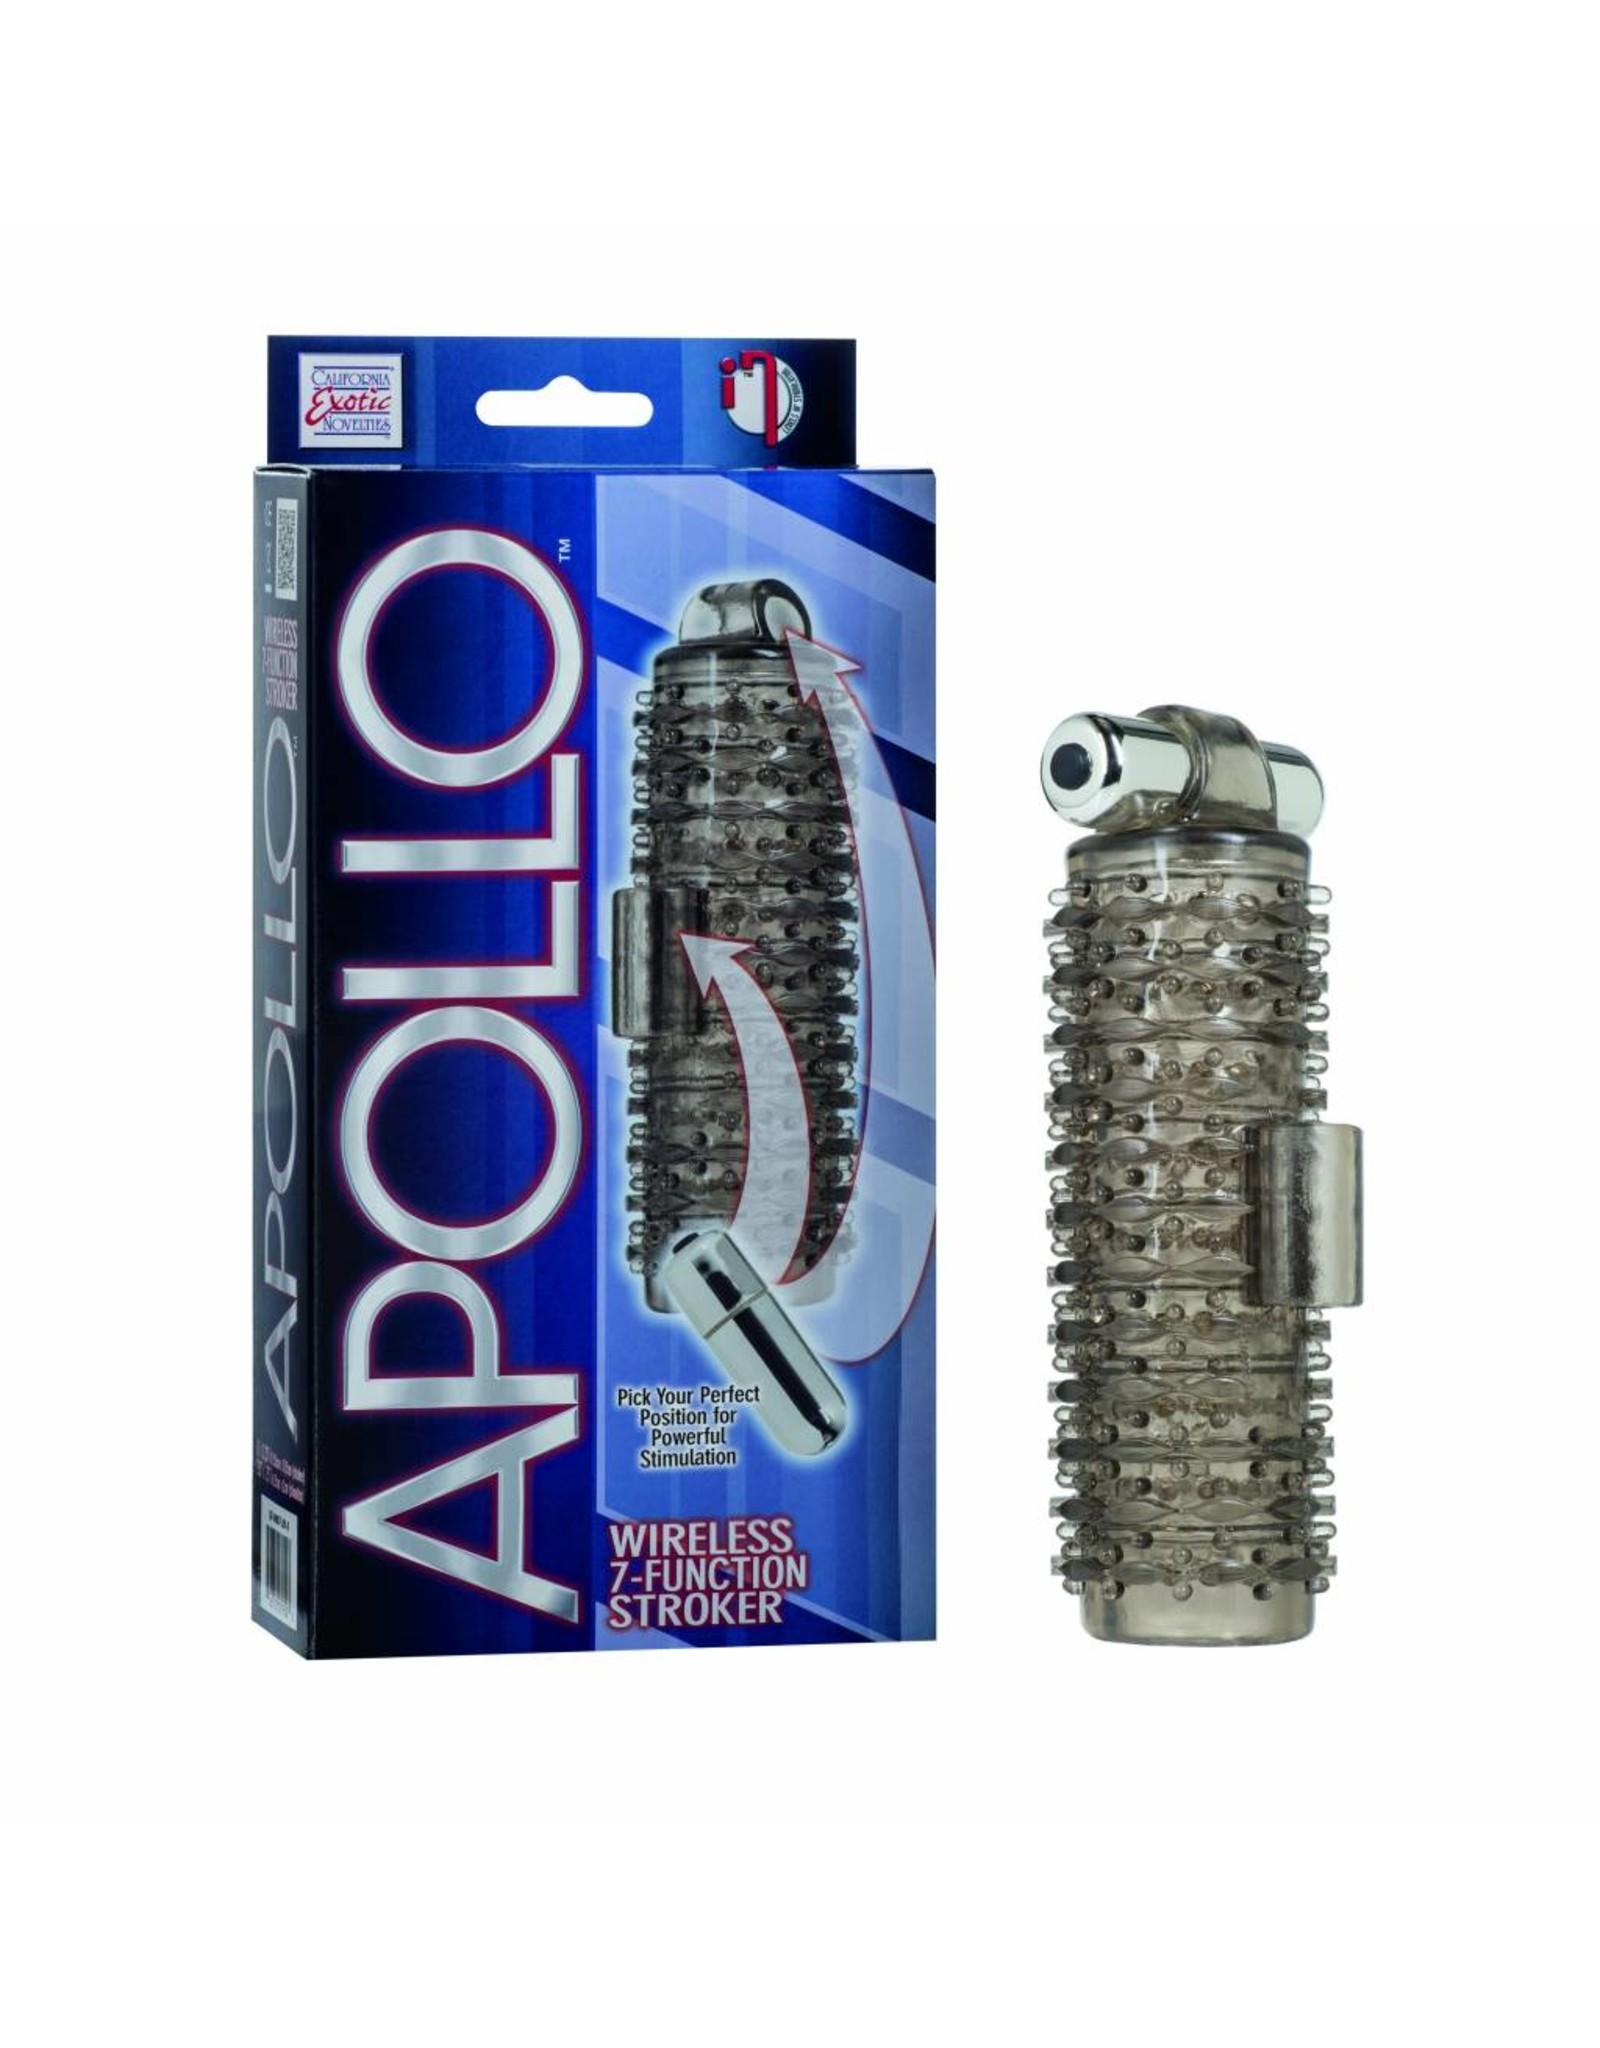 Apollo Wireless 7-Function masturbateur